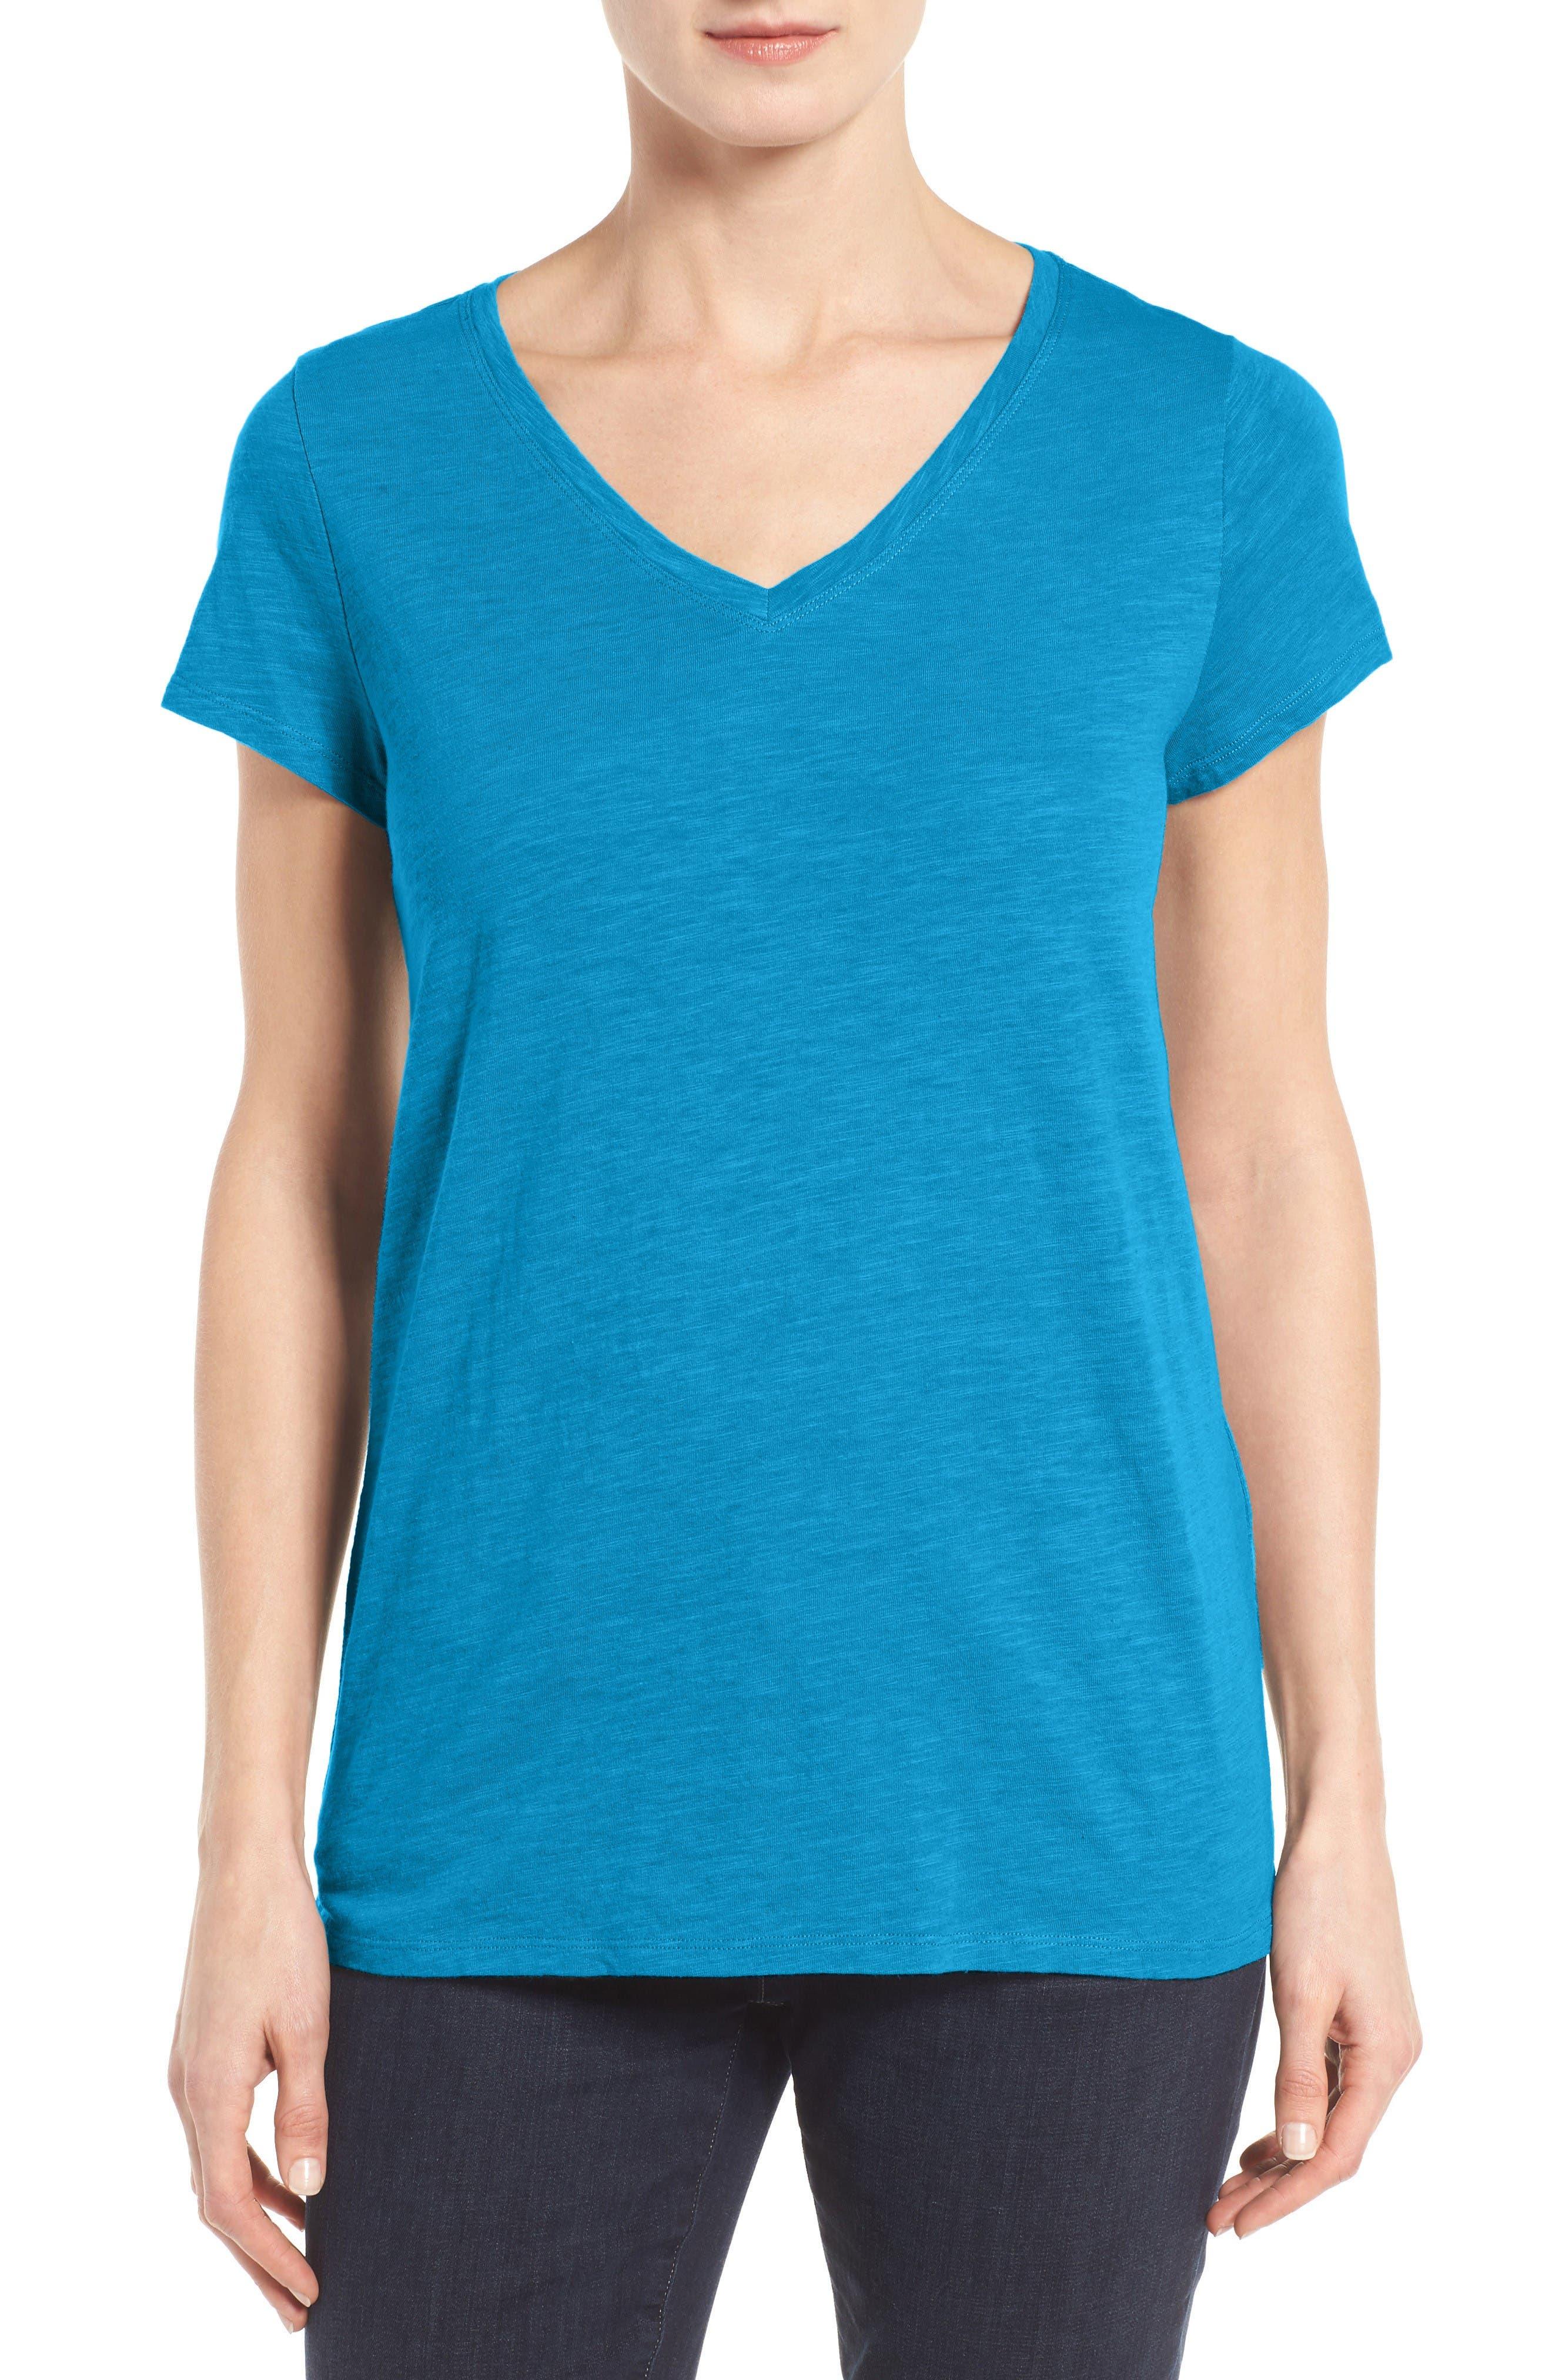 Eileen Fisher Organic Cotton V-Neck Tee (Regular & Petite) (Nordstrom Exclusive)